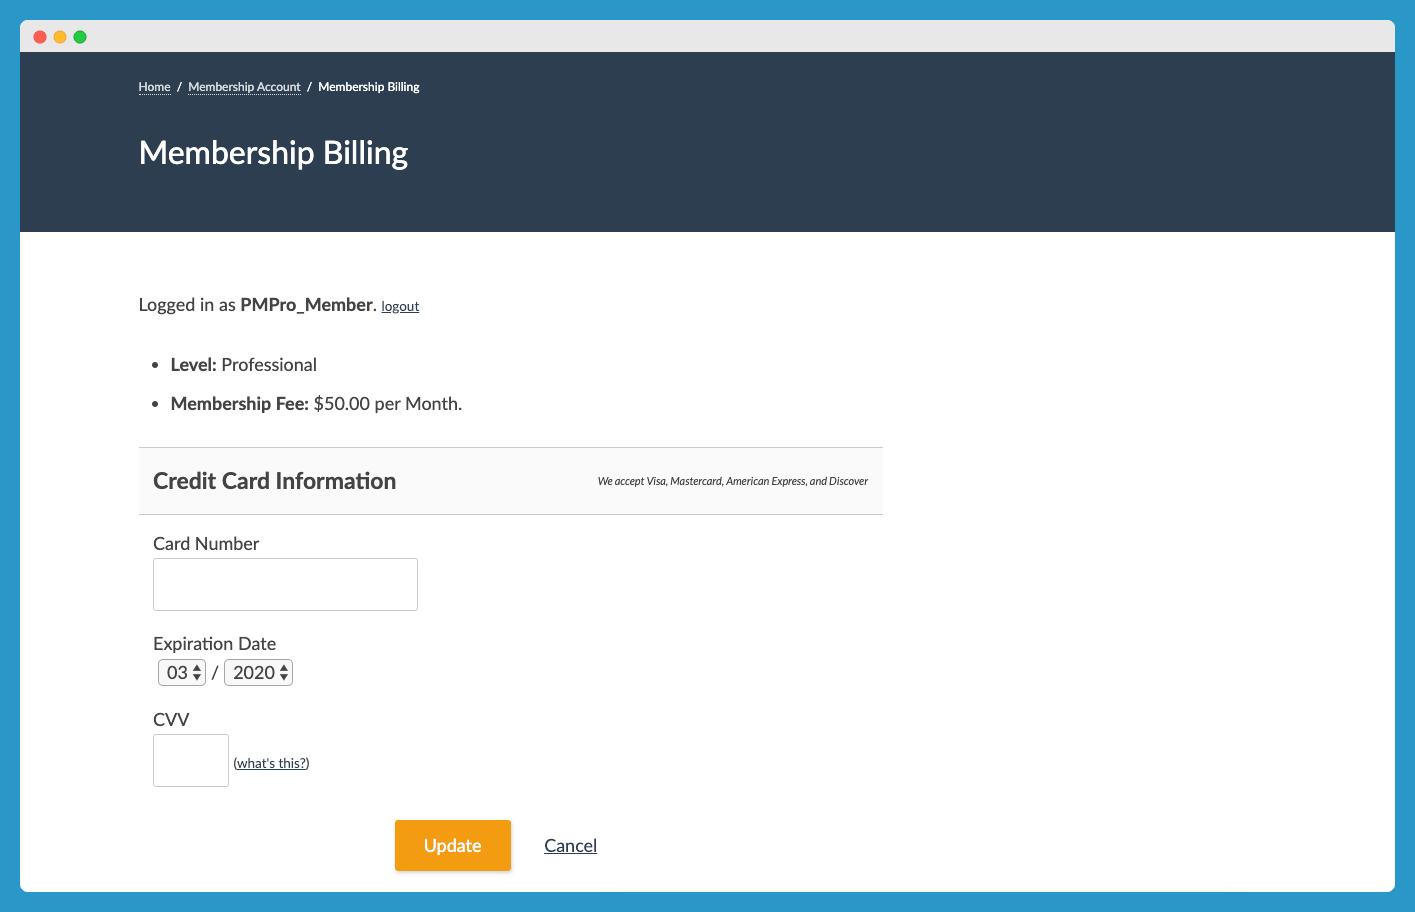 Membership Billing Page